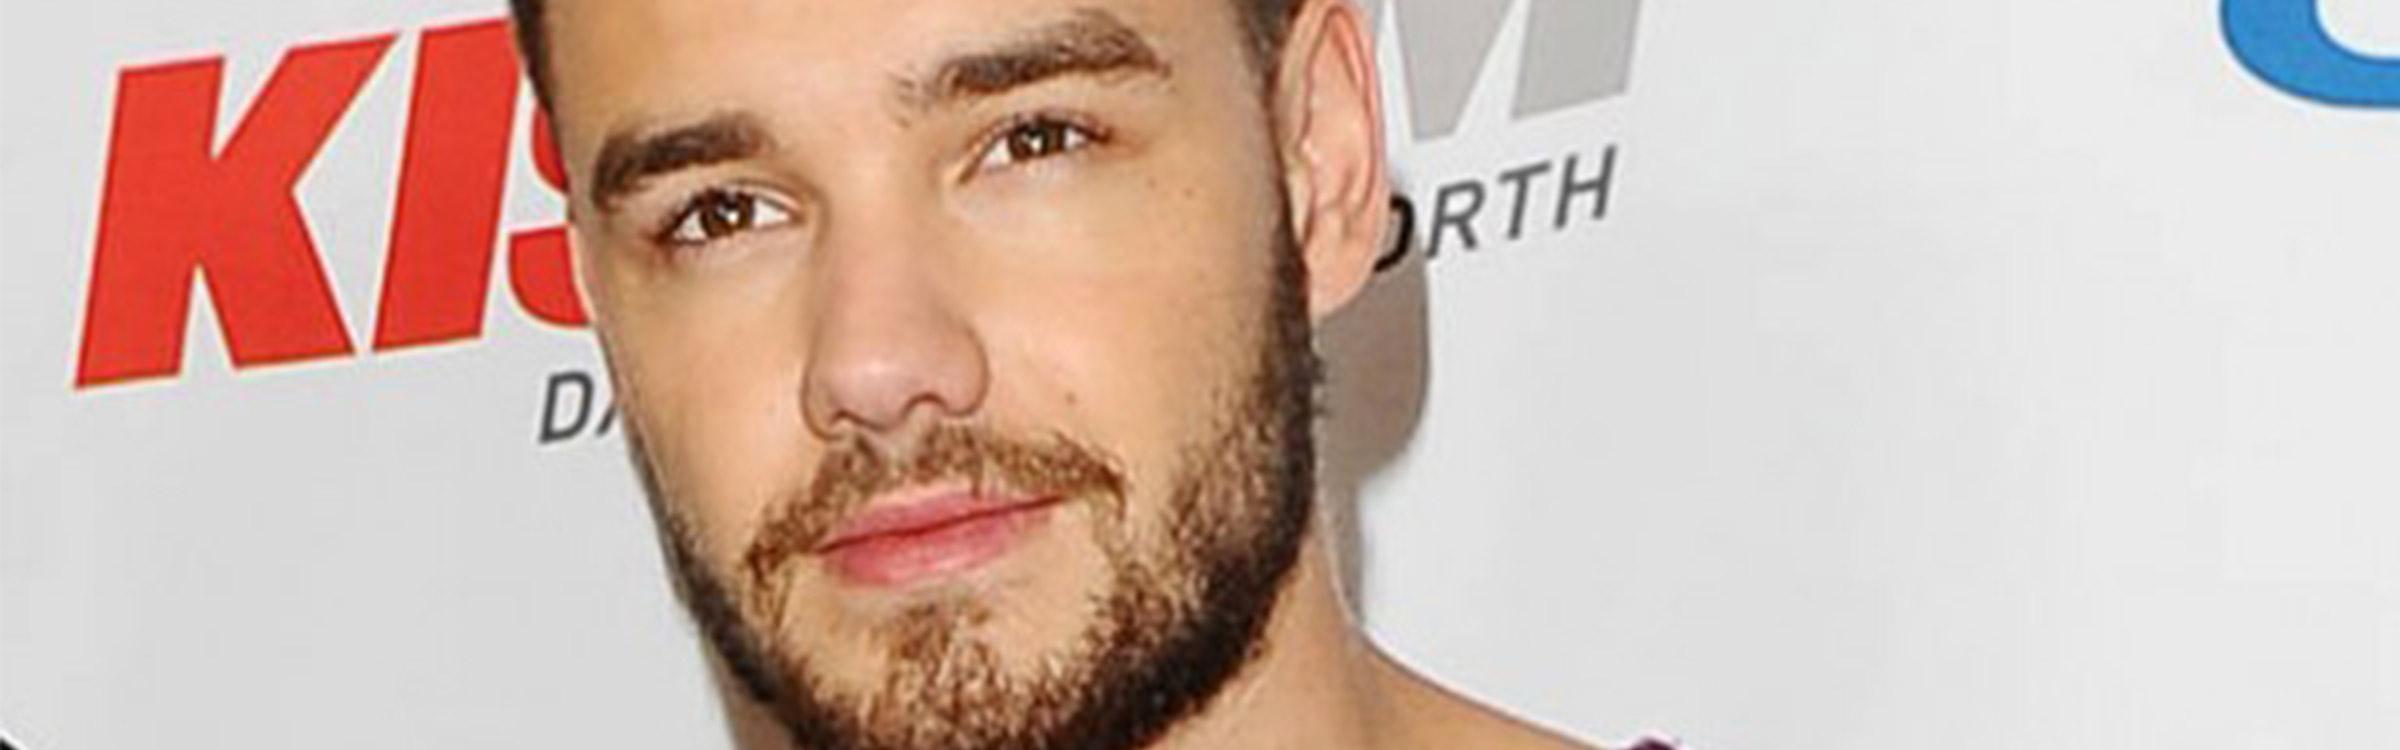 Liam headerafbeelding